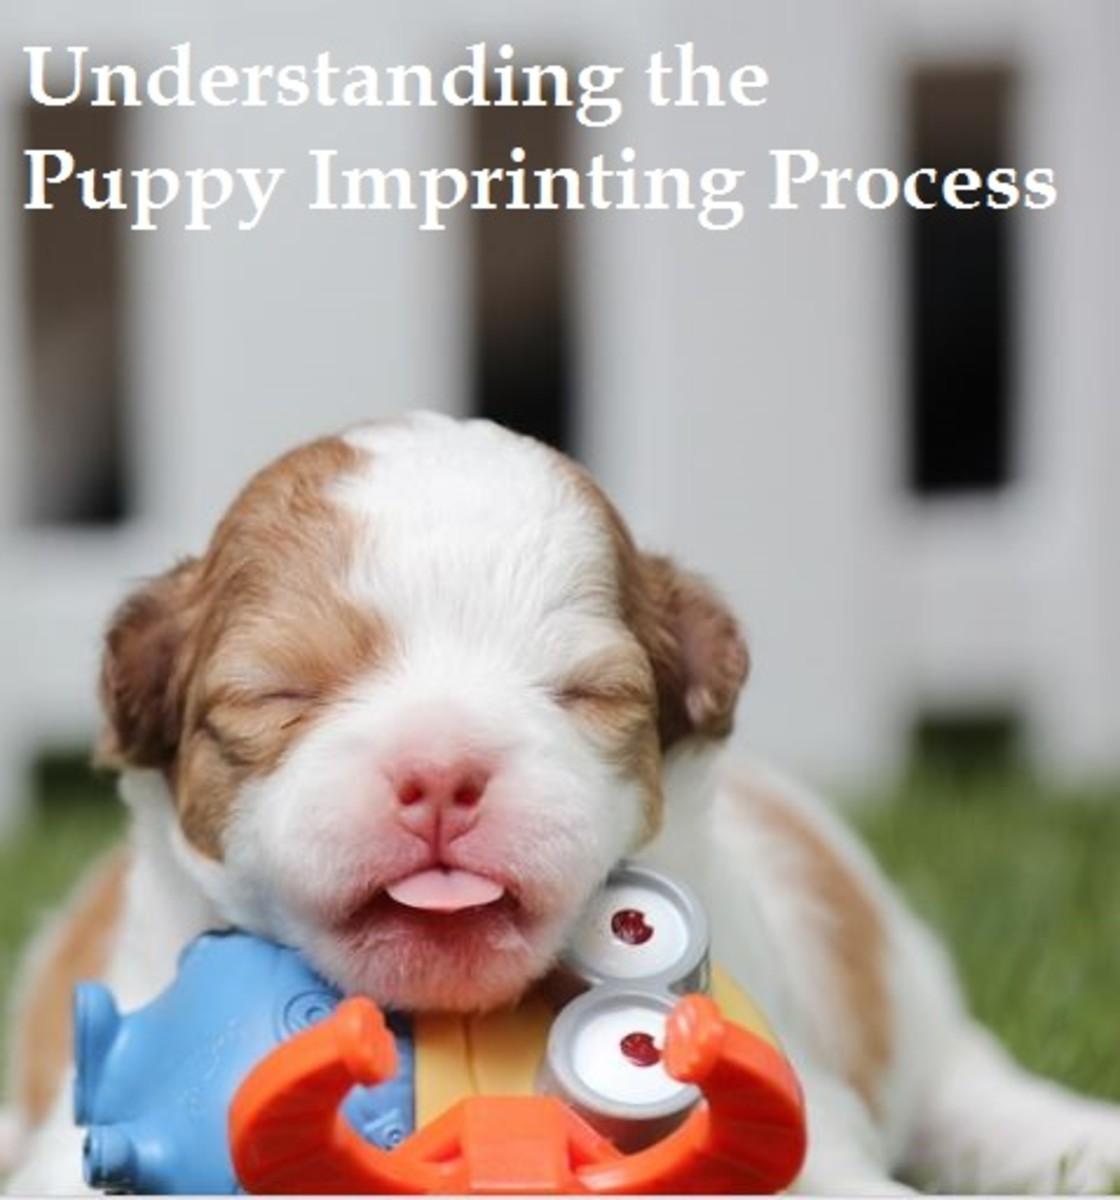 puppy imprinting